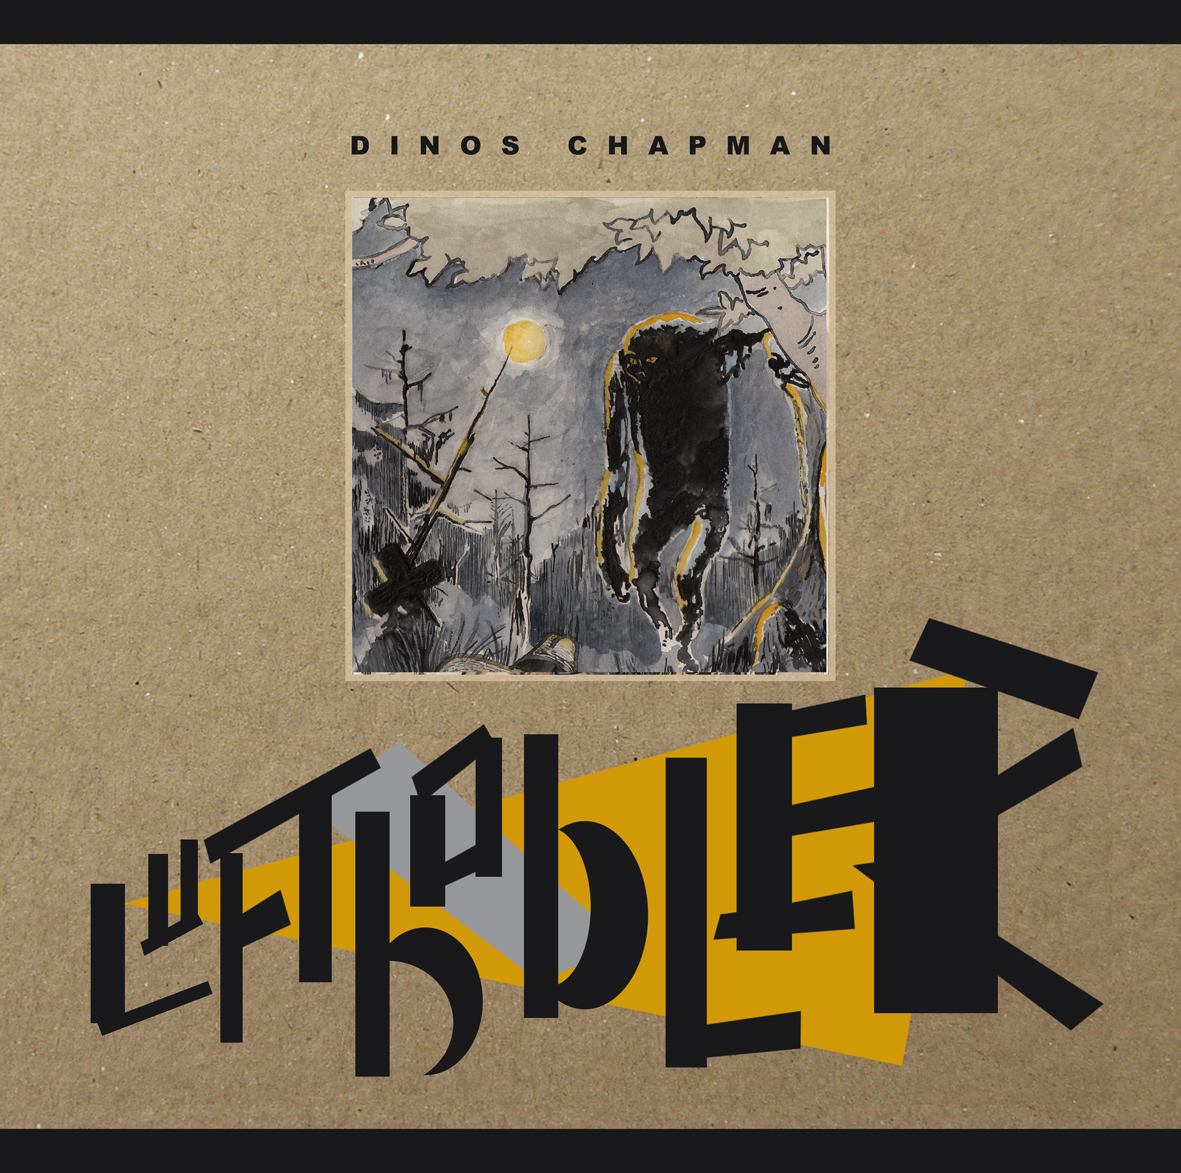 Dinos Chapman album